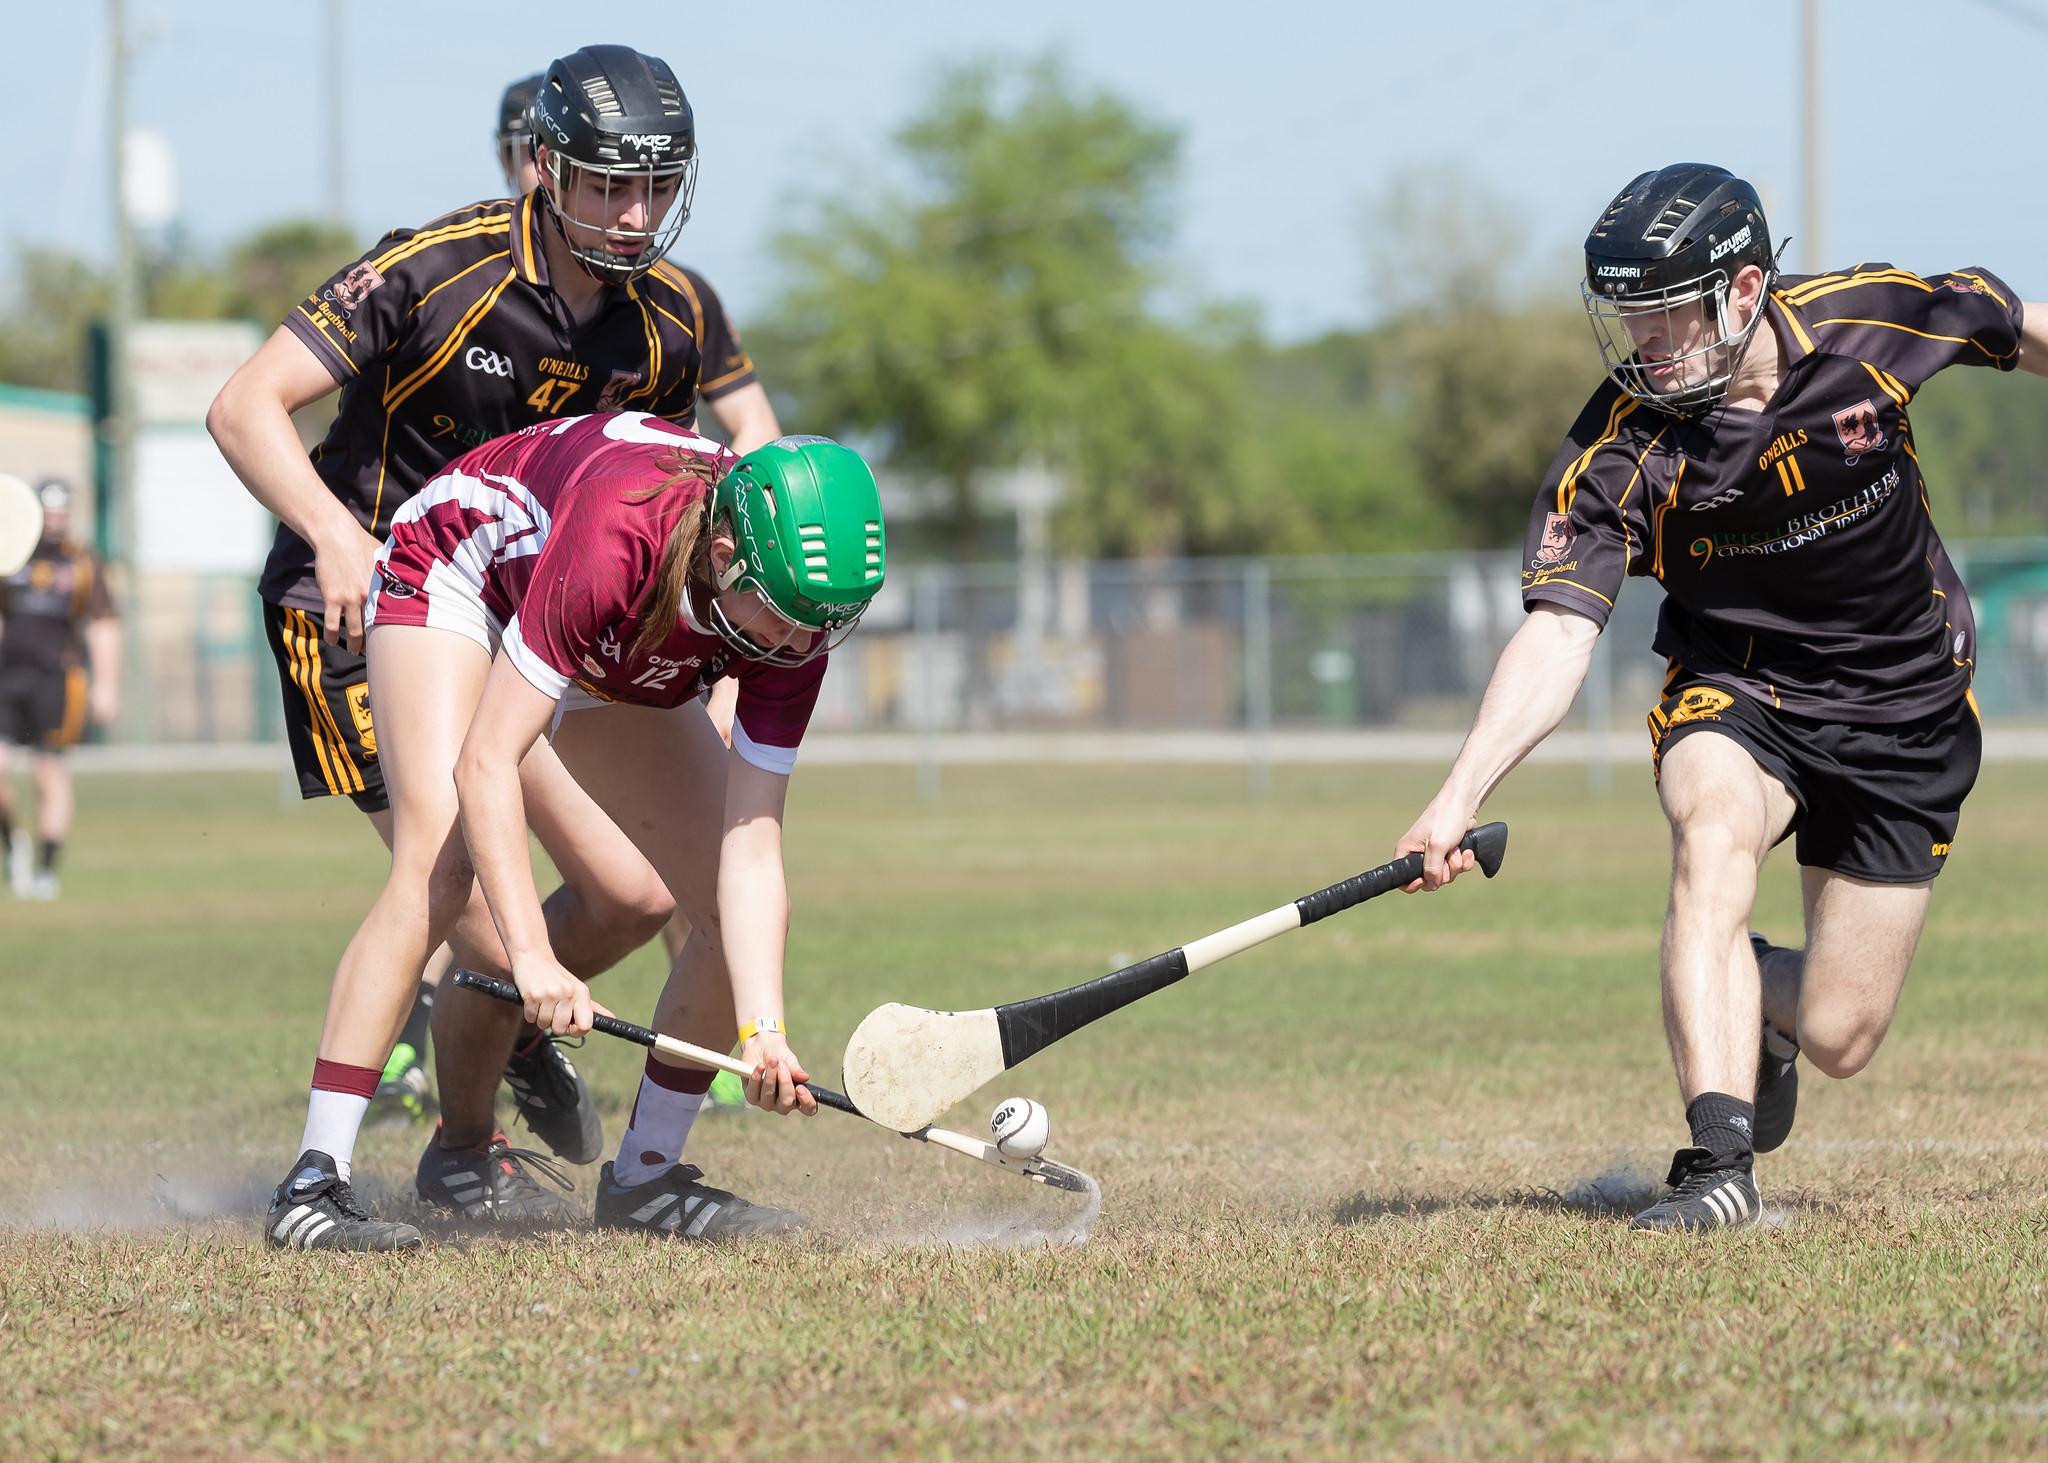 An Irishmen flicks it away from the opponents